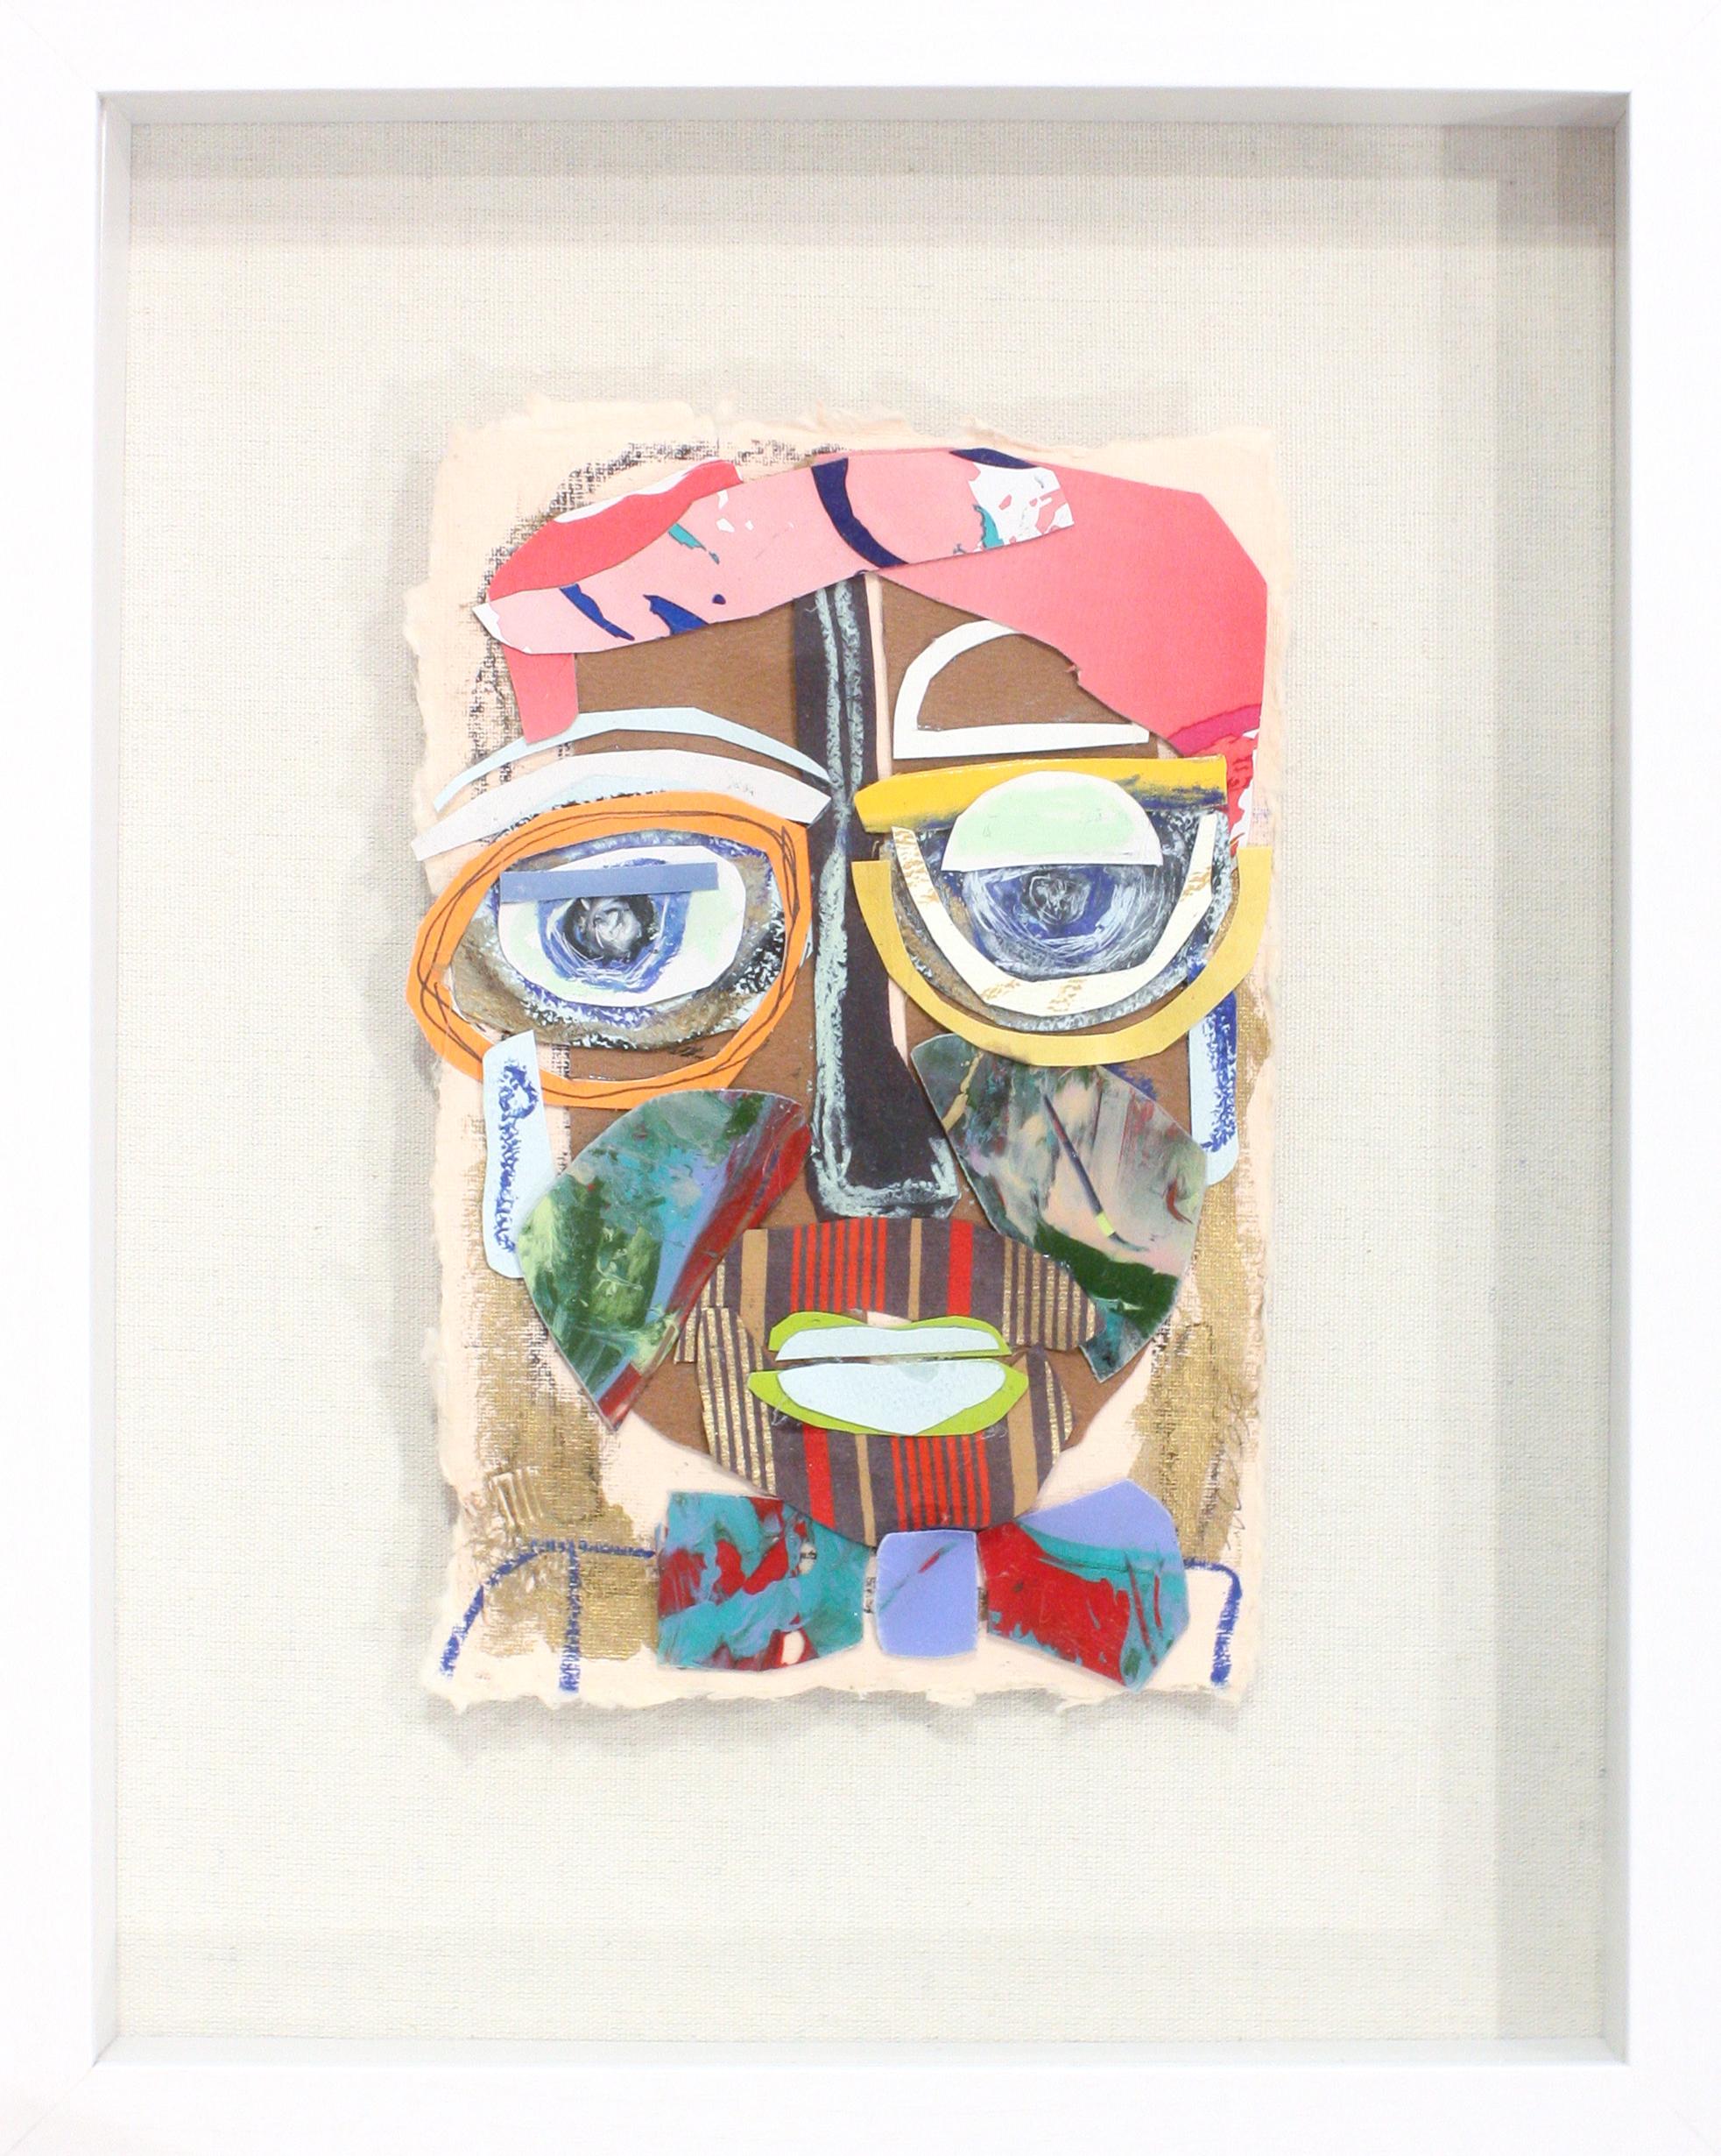 "Fredrick - 4"" x 6"" artwork, 11"" x 14"" frameMixed media, white shadowbox frameSOLD"